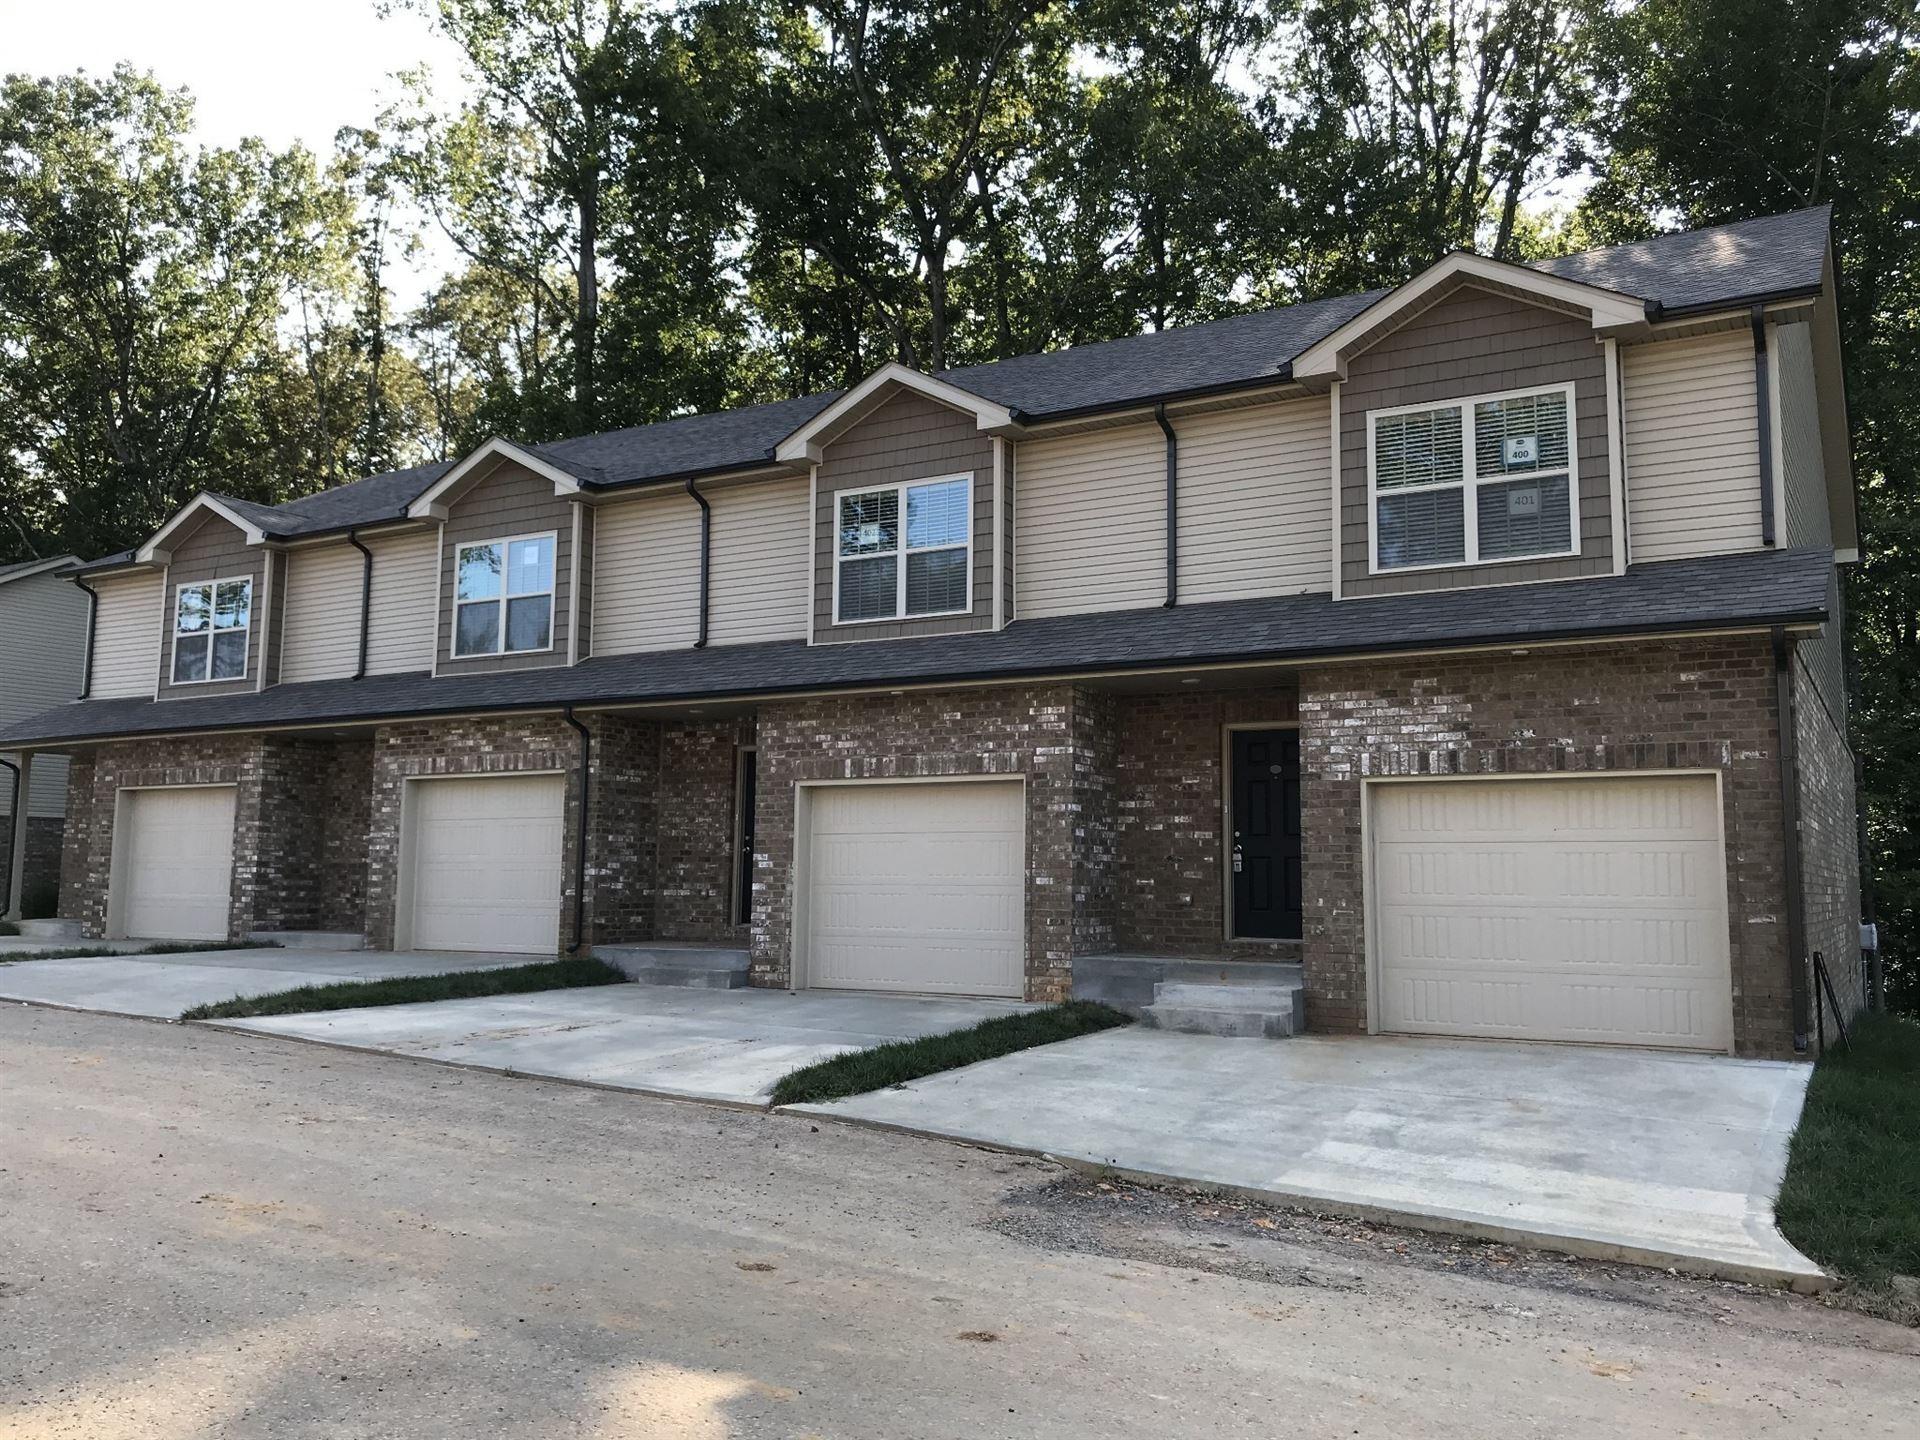 135 Country Lane Unit 803, Clarksville, TN 37043 - MLS#: 2177049